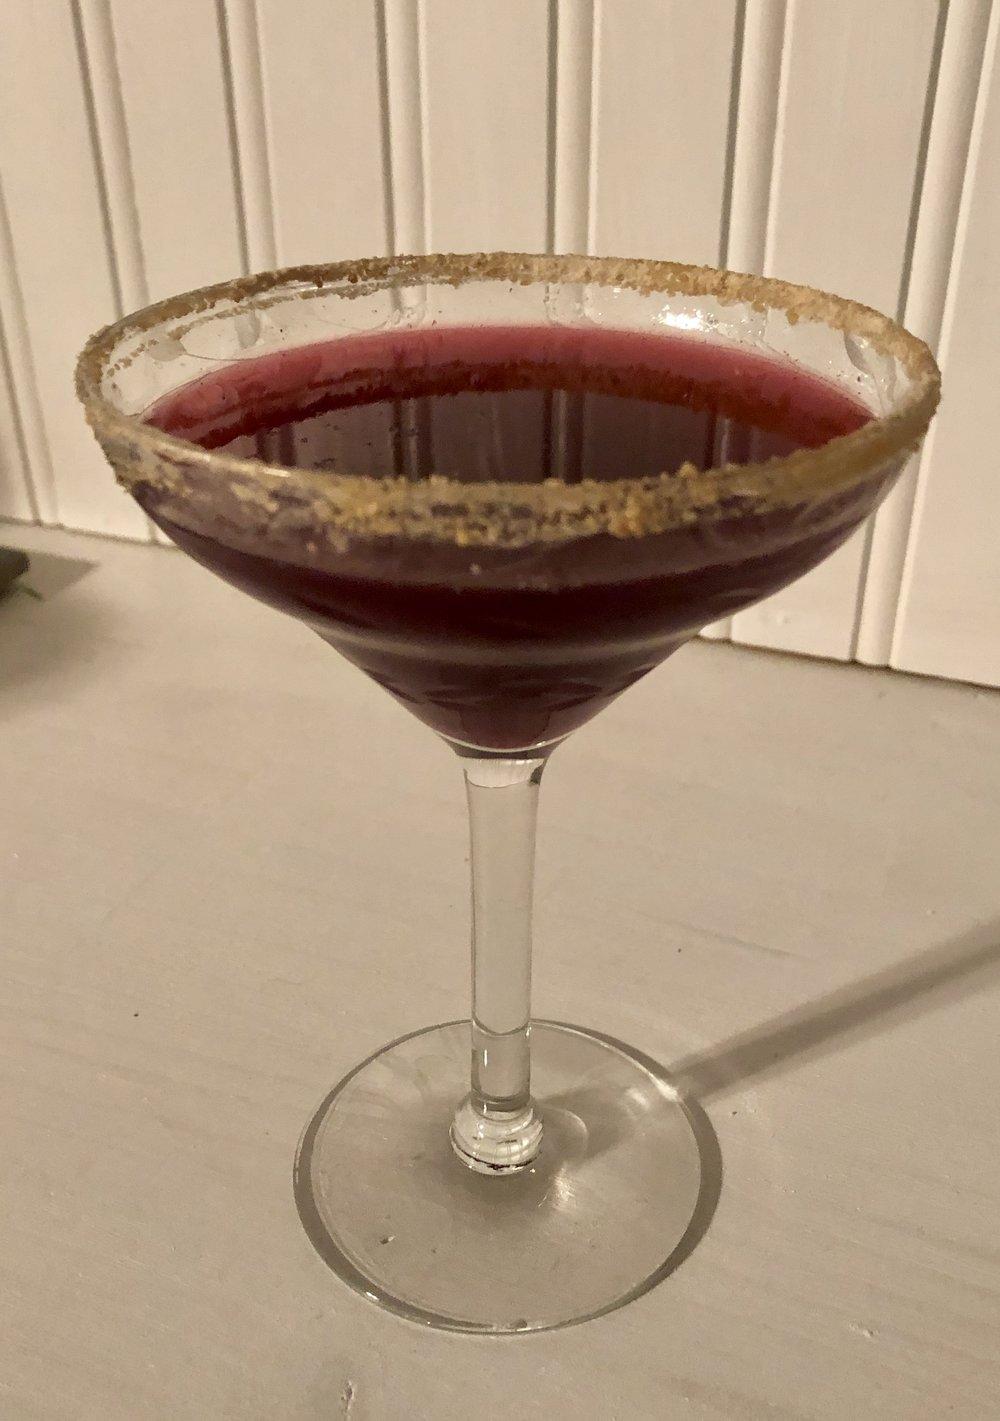 Sugar House Widow cocktail